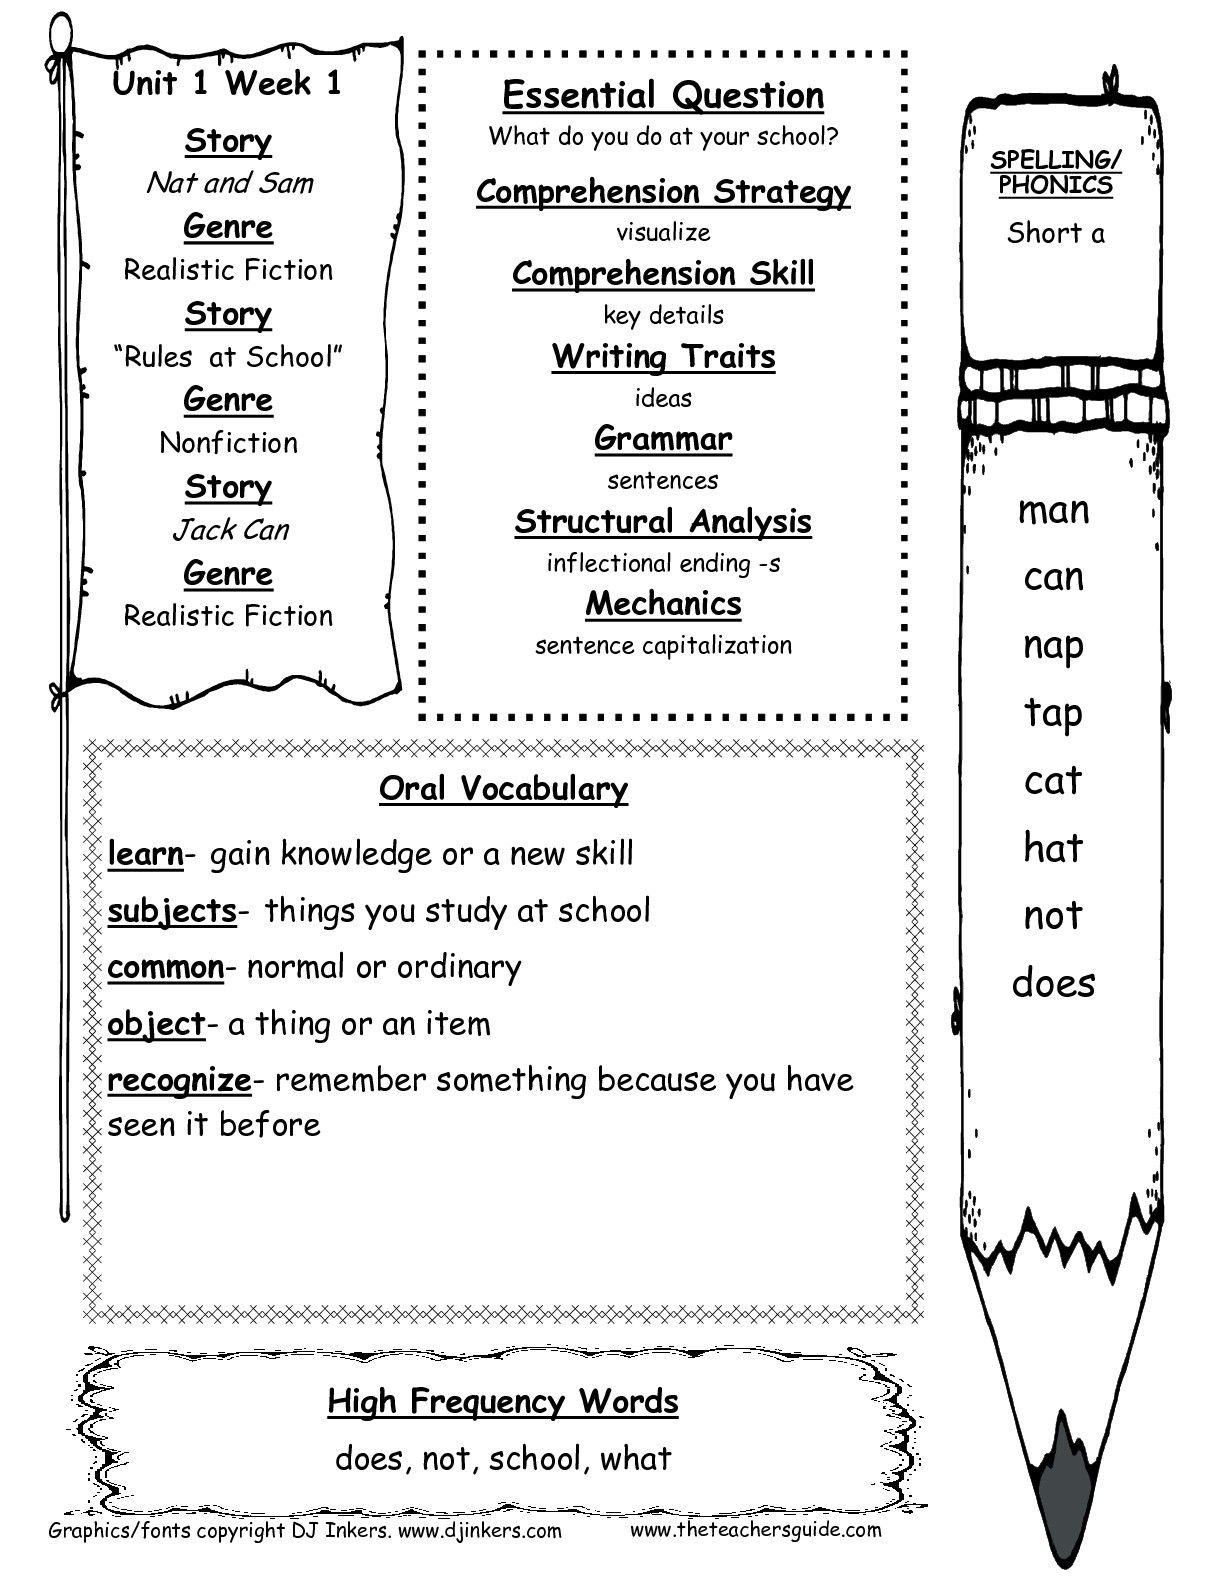 1st Grade Grammar Worksheets Math Worksheet For Kids Education Quotes For Teachers Kids Math Worksheets Reading Worksheets [ 1584 x 1224 Pixel ]